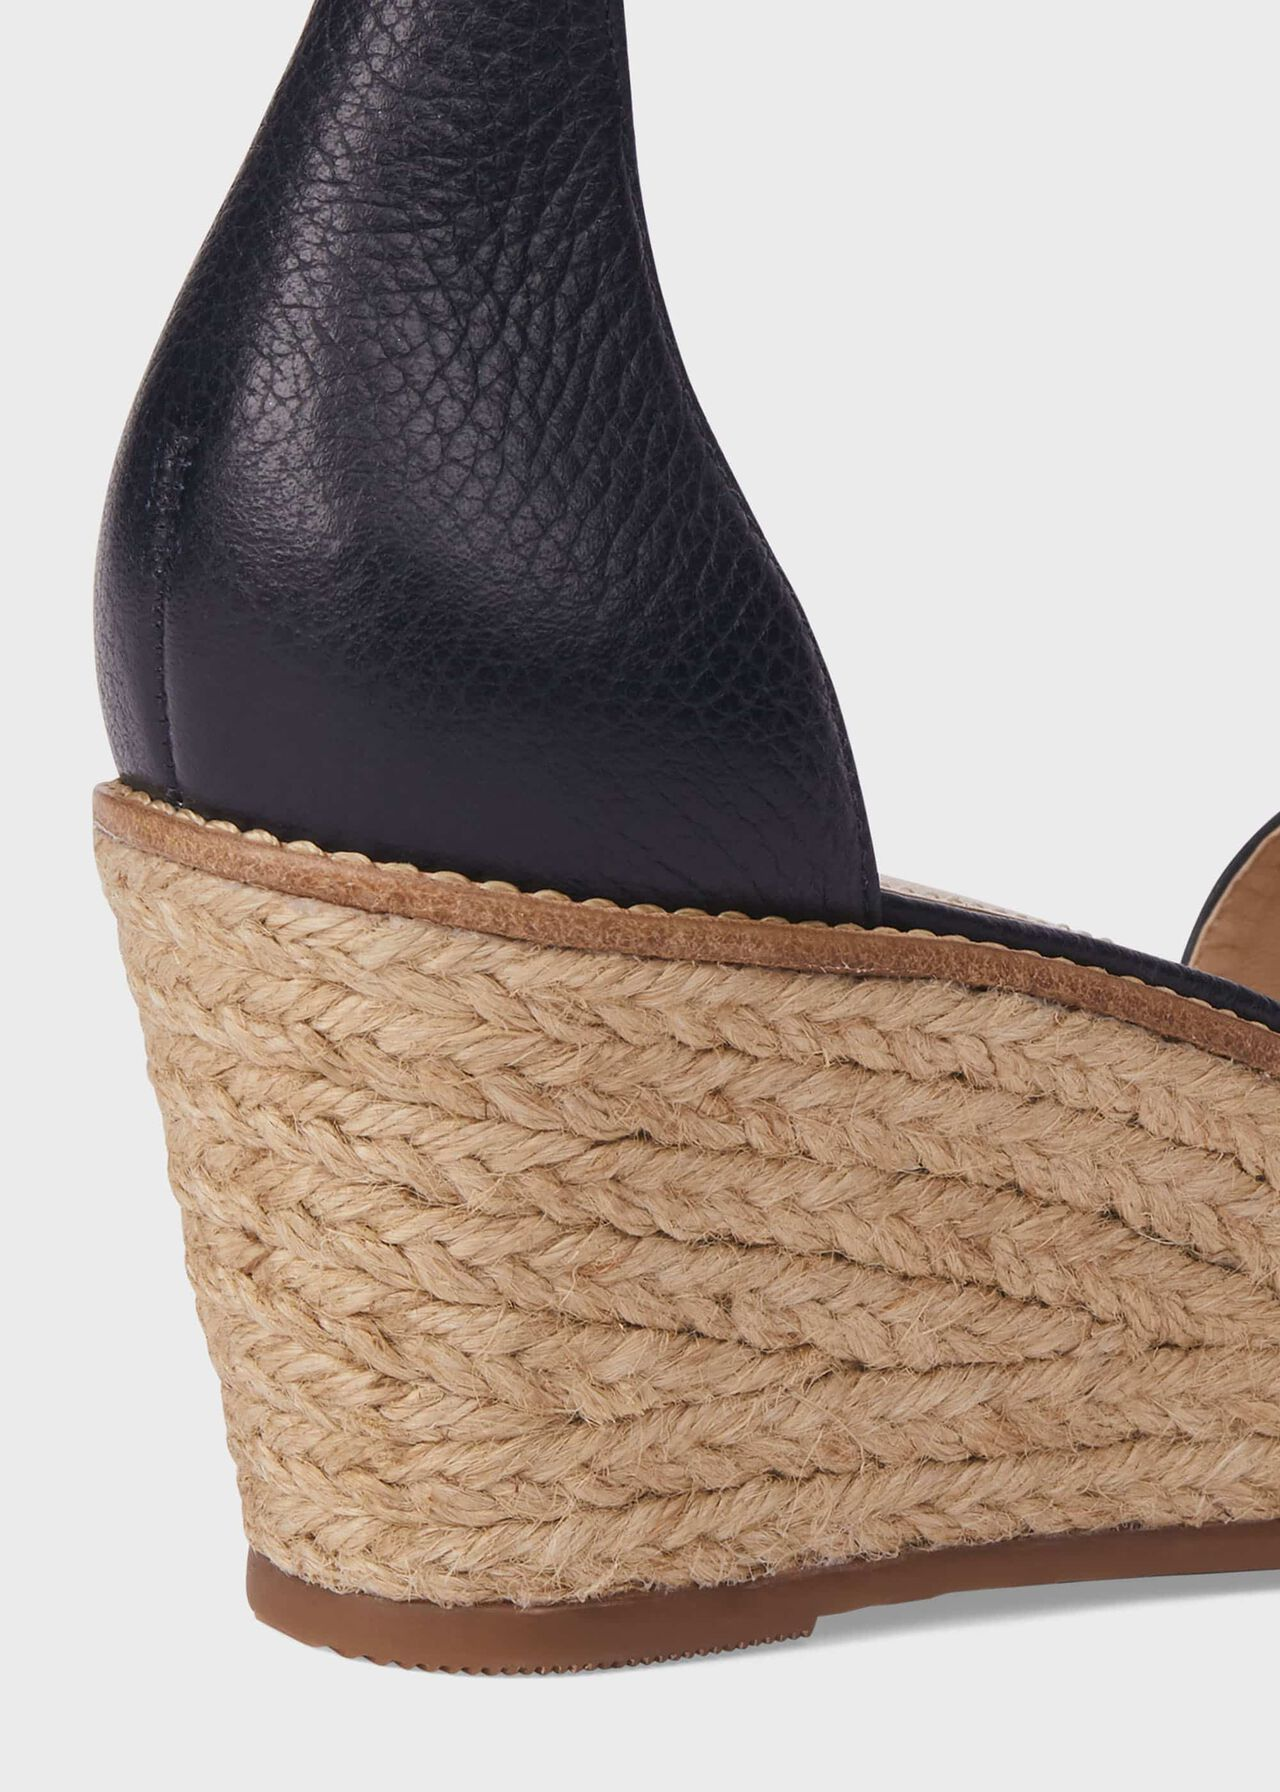 Vespa Leather Wedge Espadrilles, Navy, hi-res